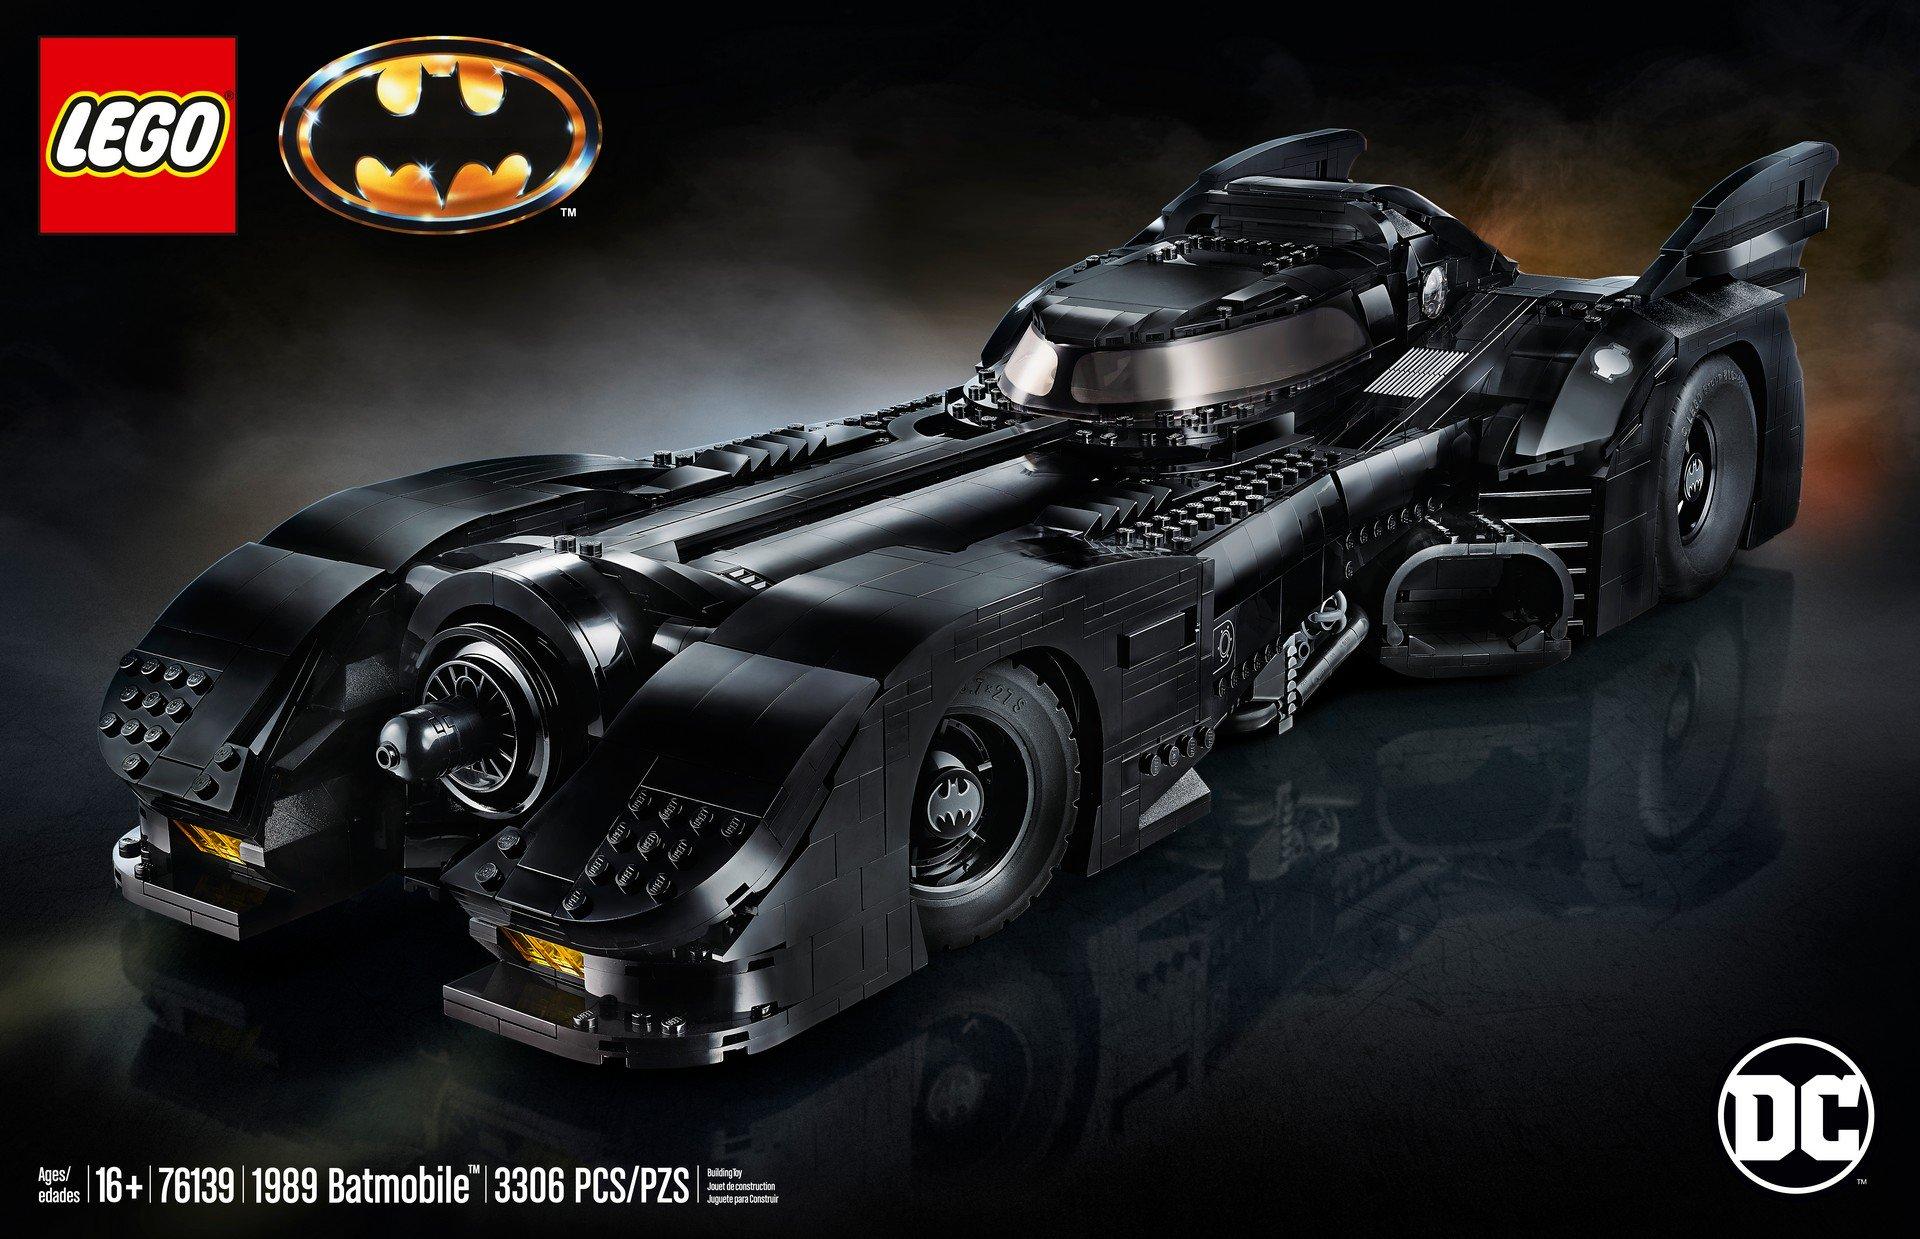 Lego-Batmobile-kit-1989-19